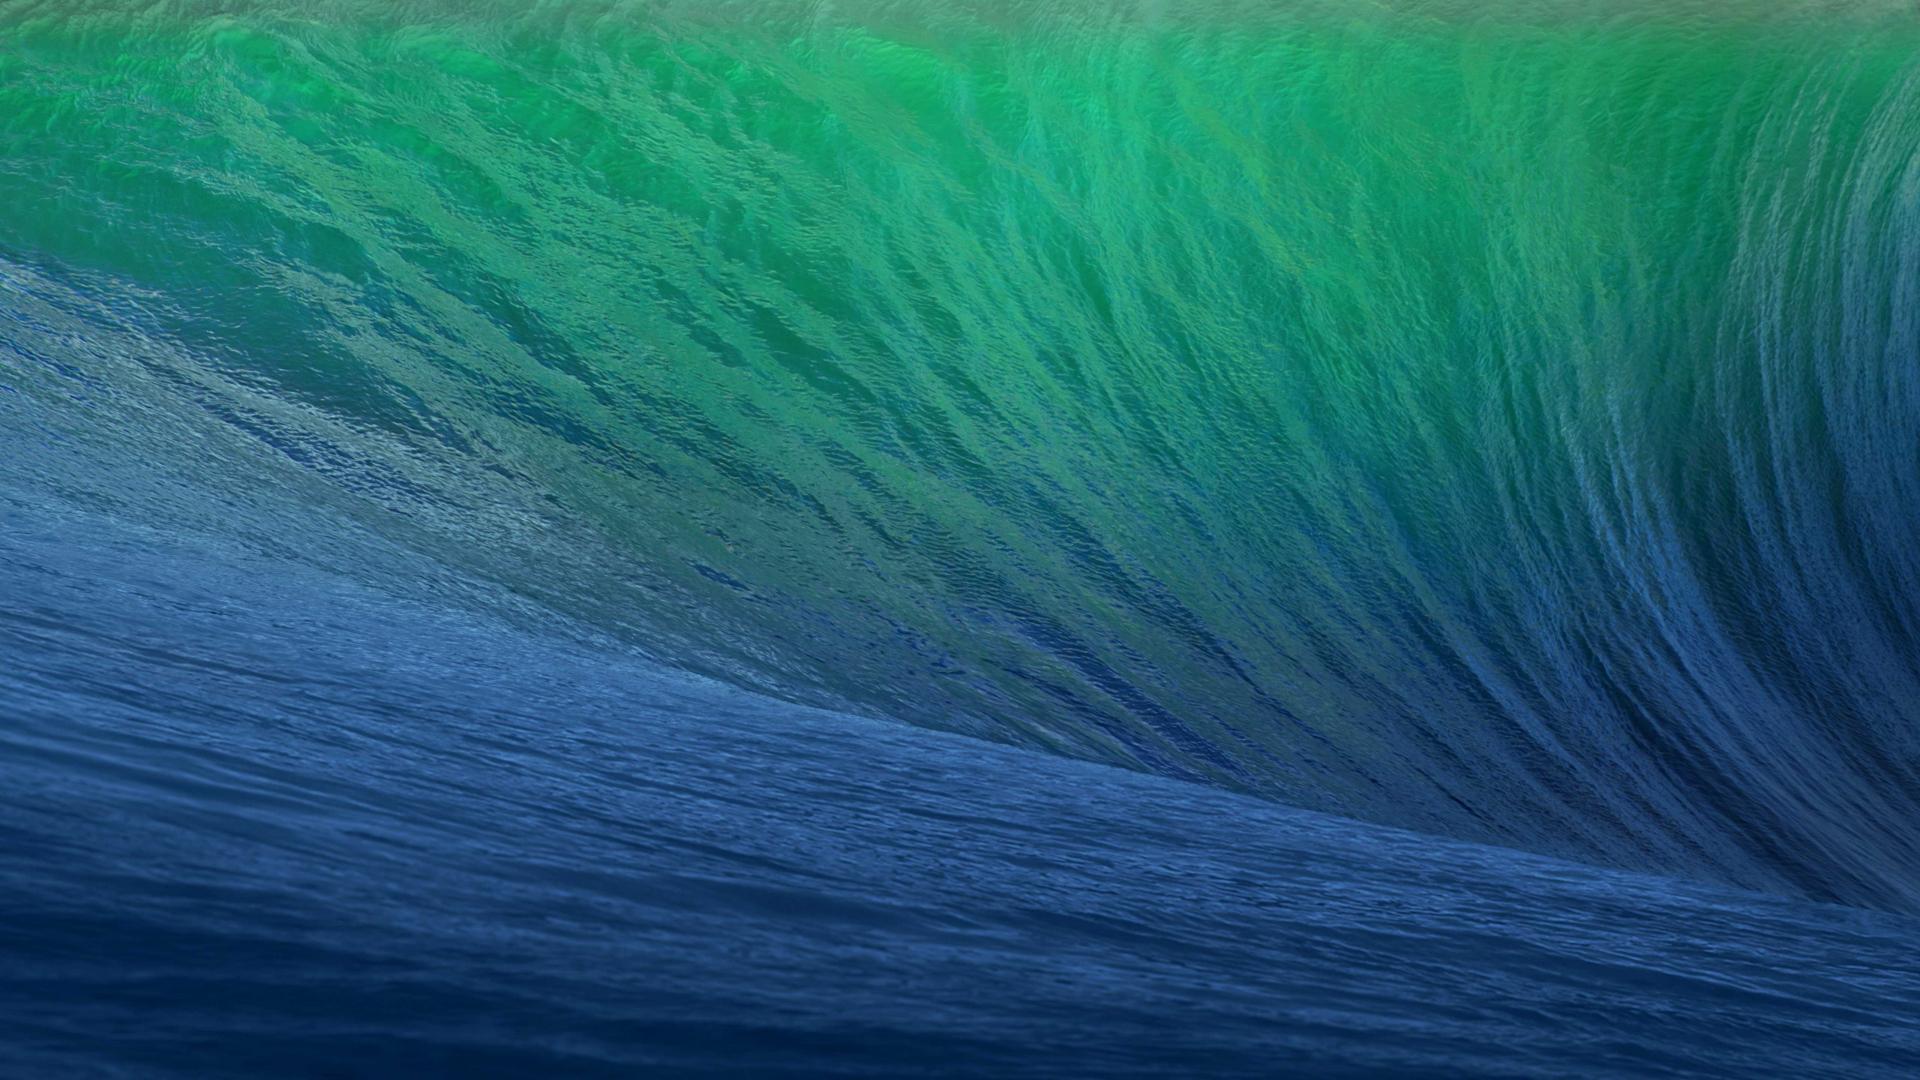 coolest wallpaper for mac